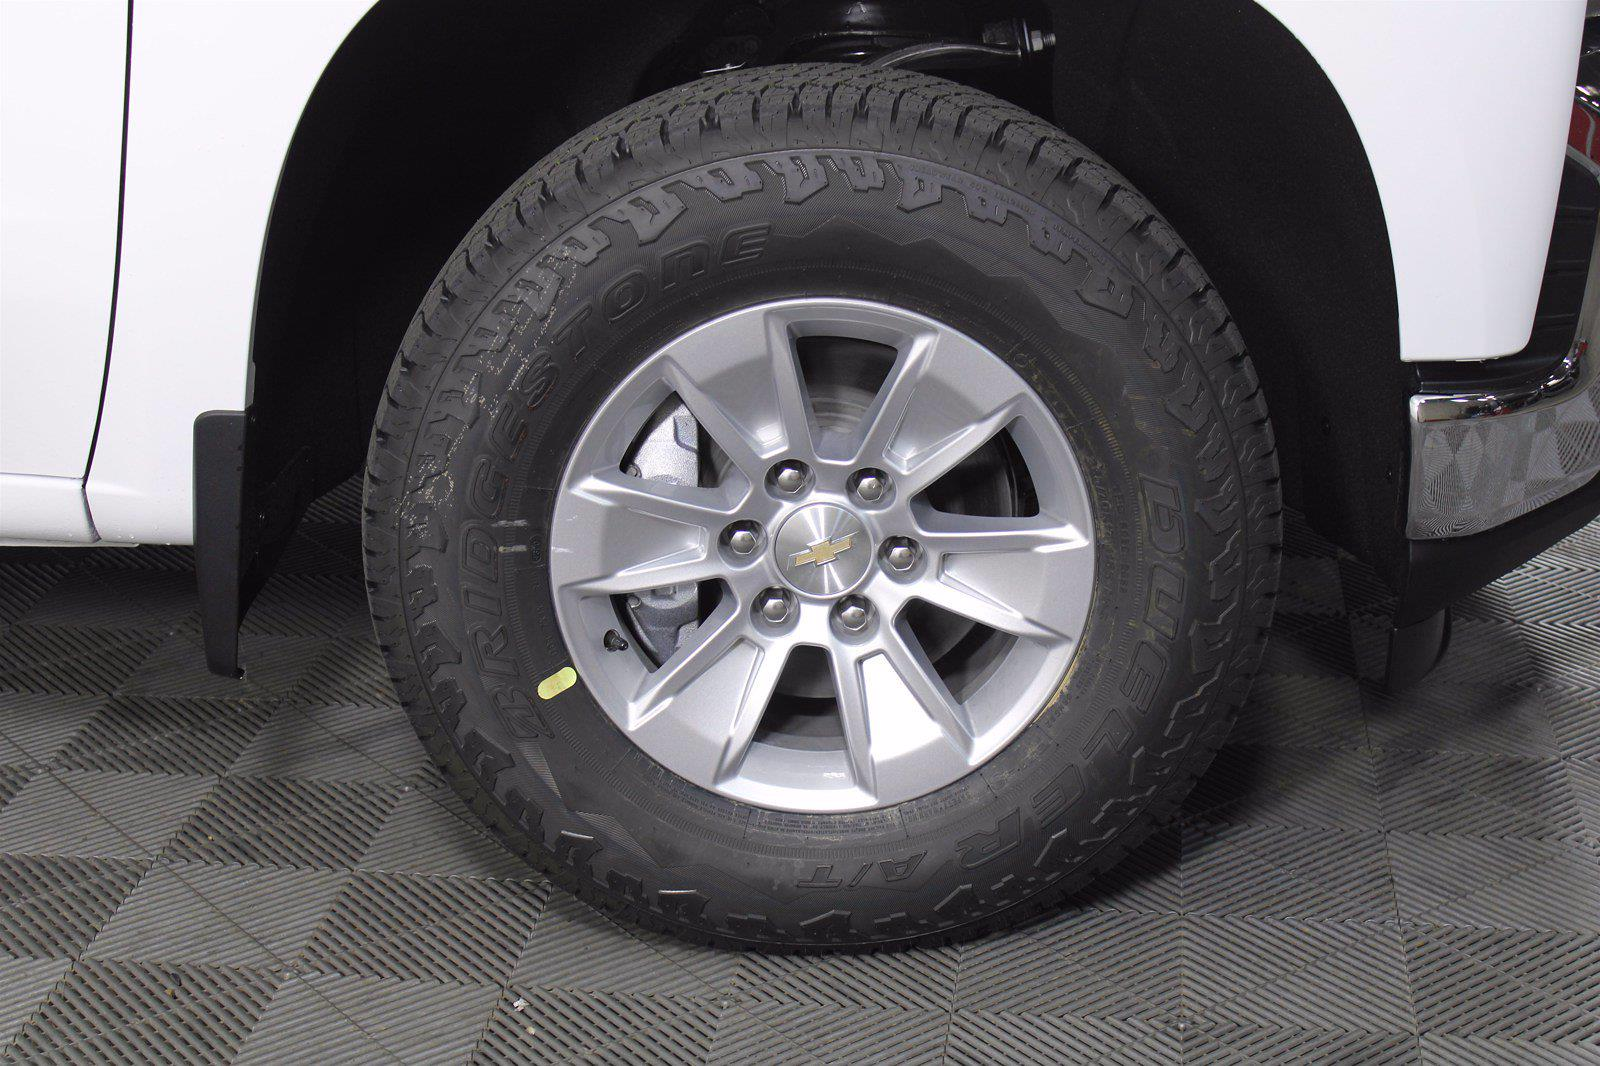 2021 Chevrolet Silverado 1500 Regular Cab 4x2, Pickup #D111066 - photo 6